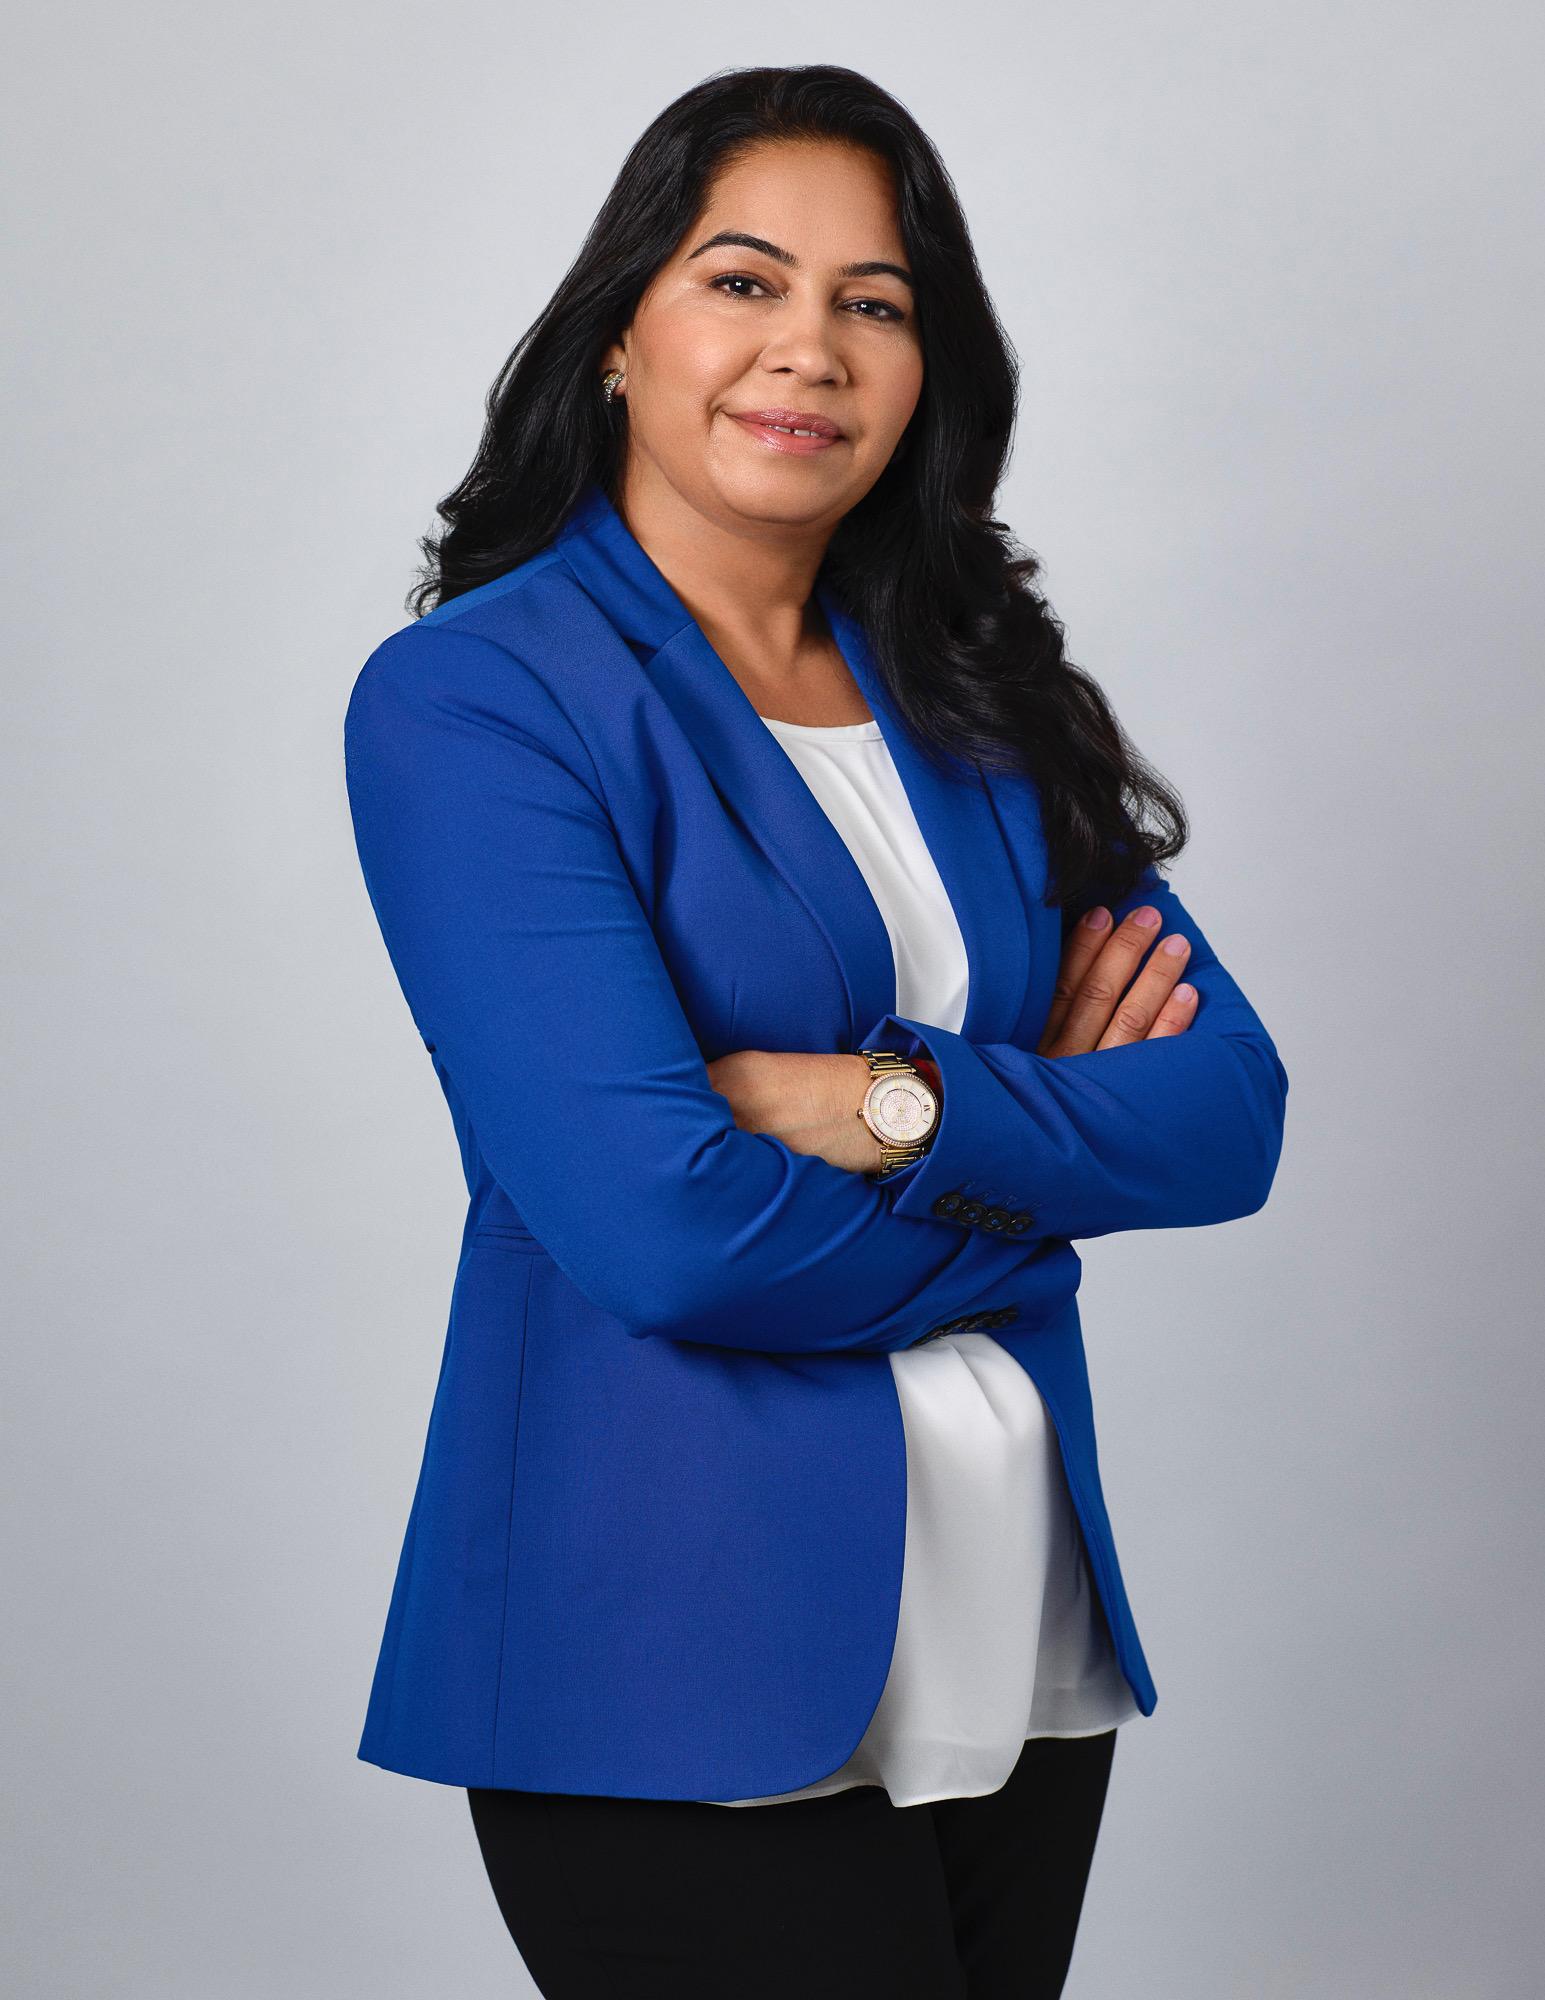 corporate business headshots portrait acting professional photographer photography studio toronto family